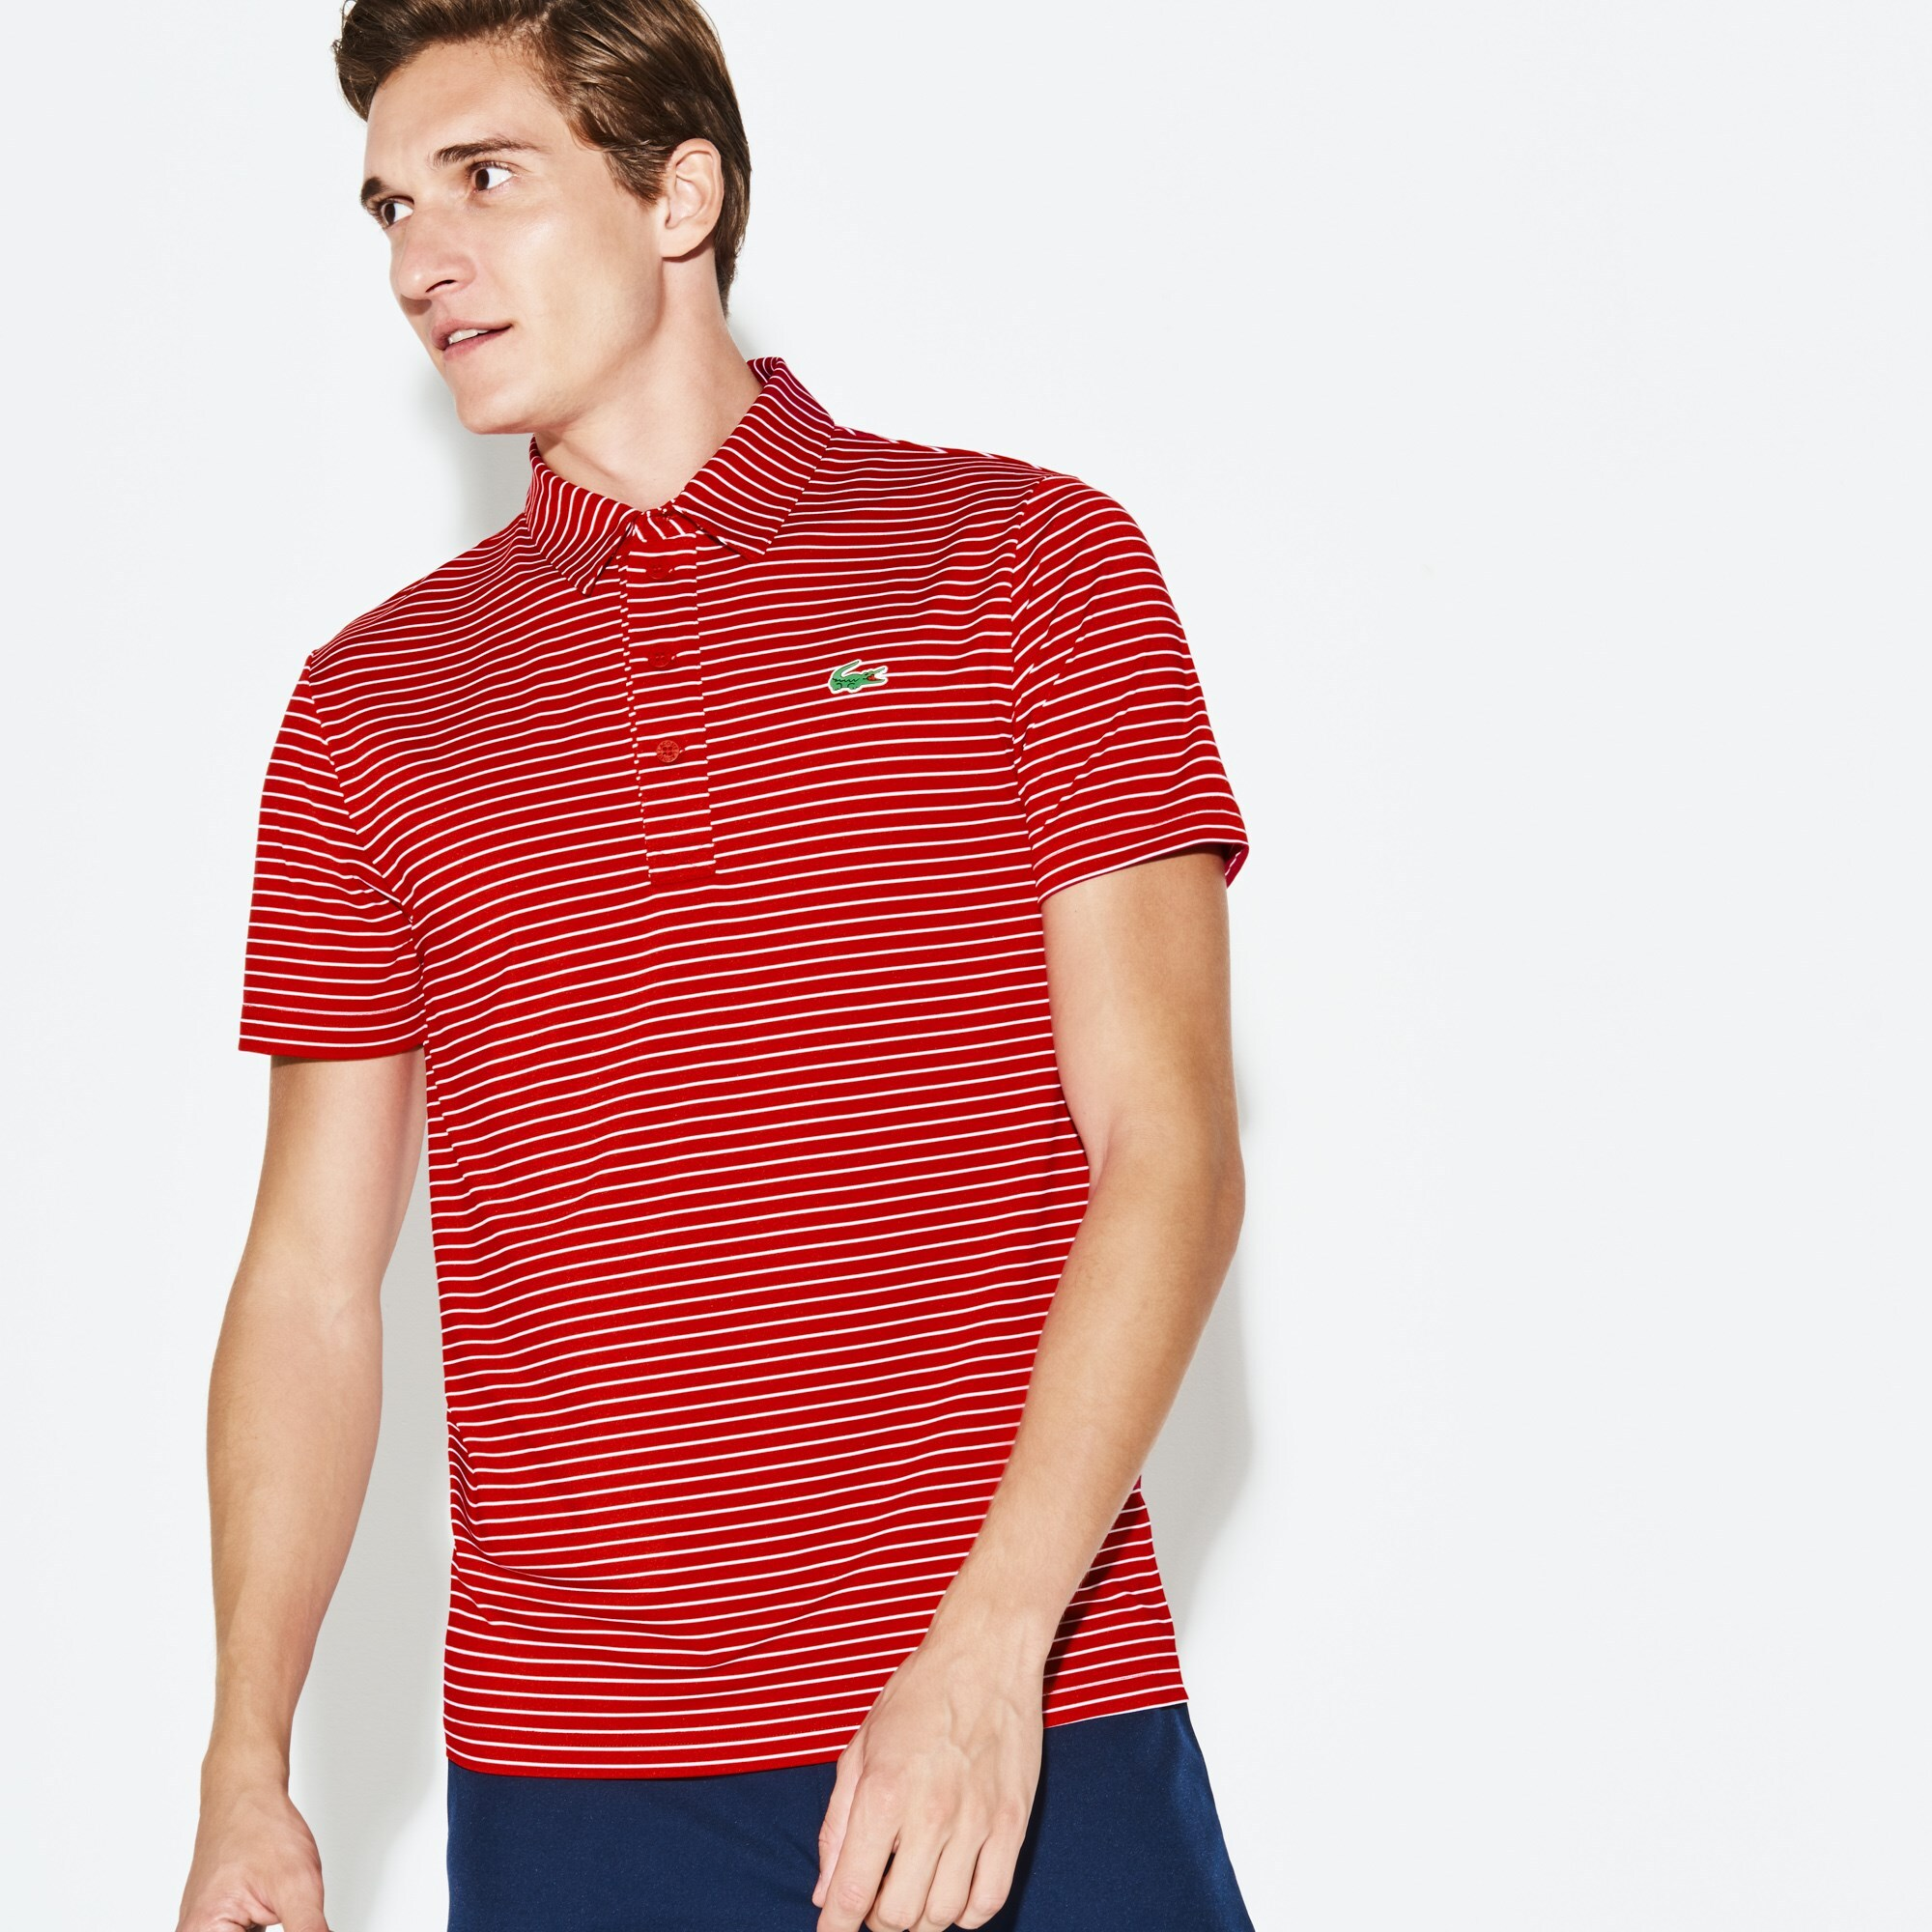 Men's Lacoste SPORT Striped Stretch Technical Jersey Golf Polo